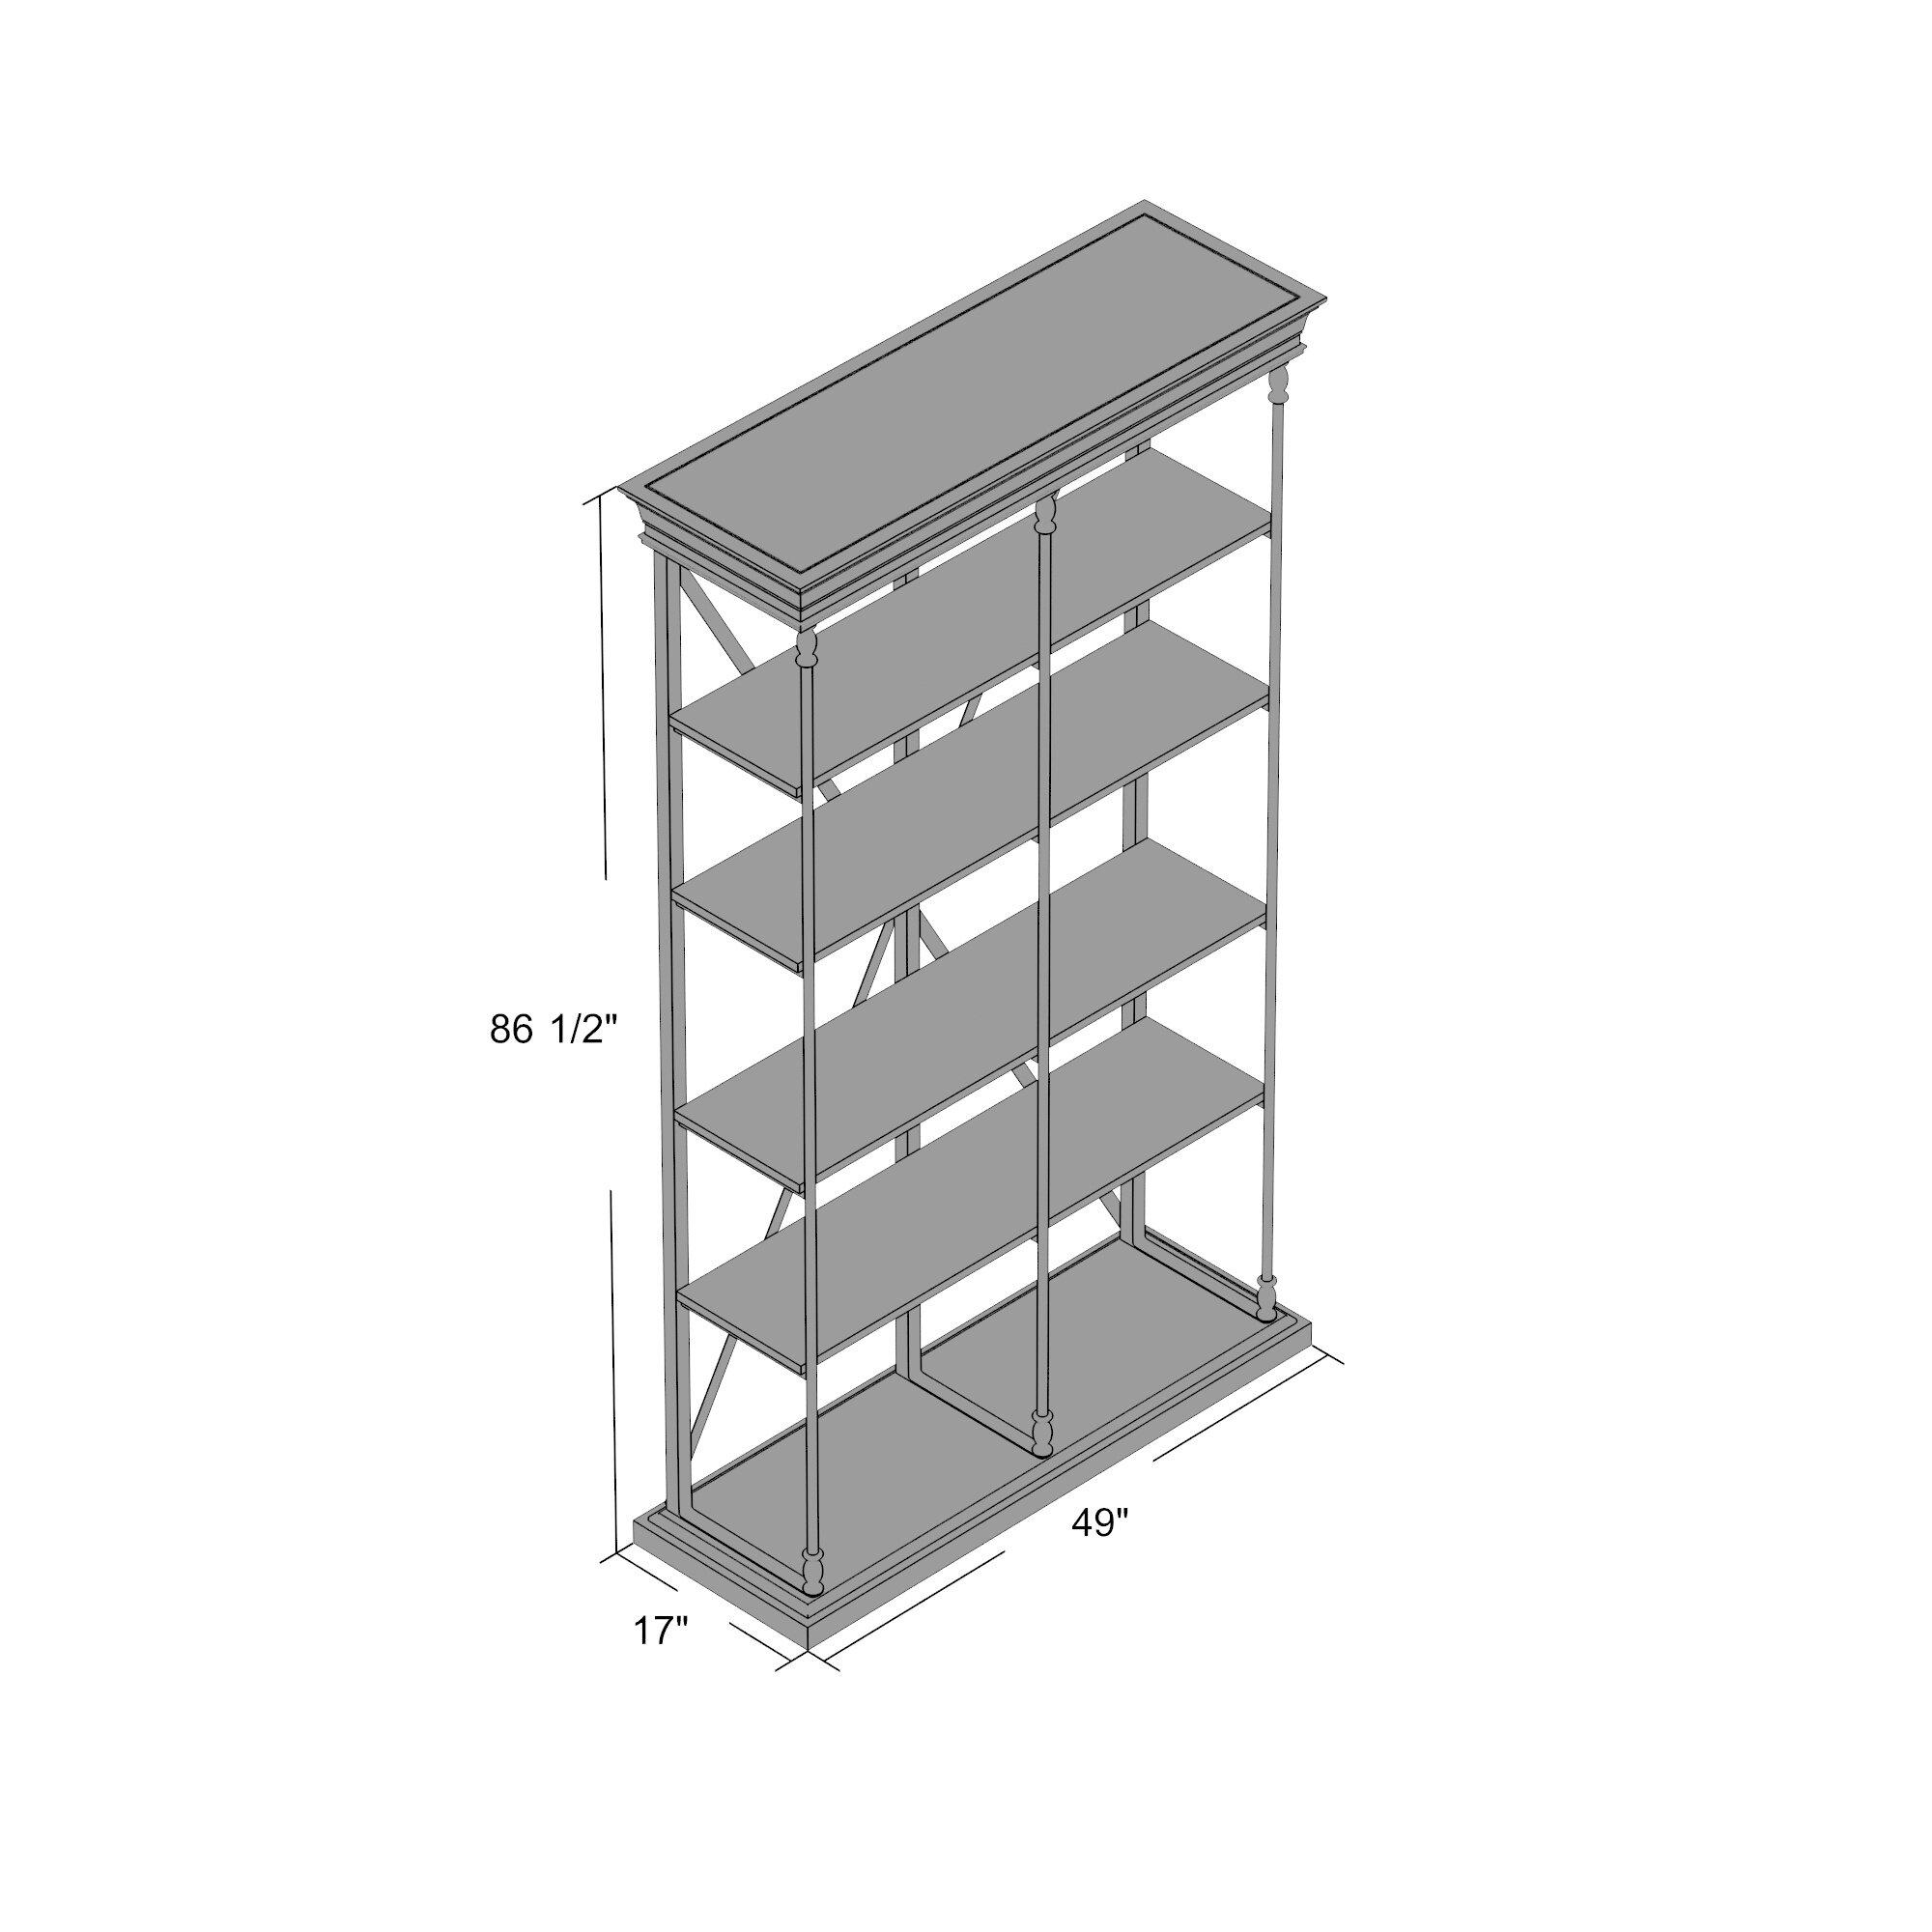 trent austin design 87 etagere bookcase reviews wayfair. Black Bedroom Furniture Sets. Home Design Ideas